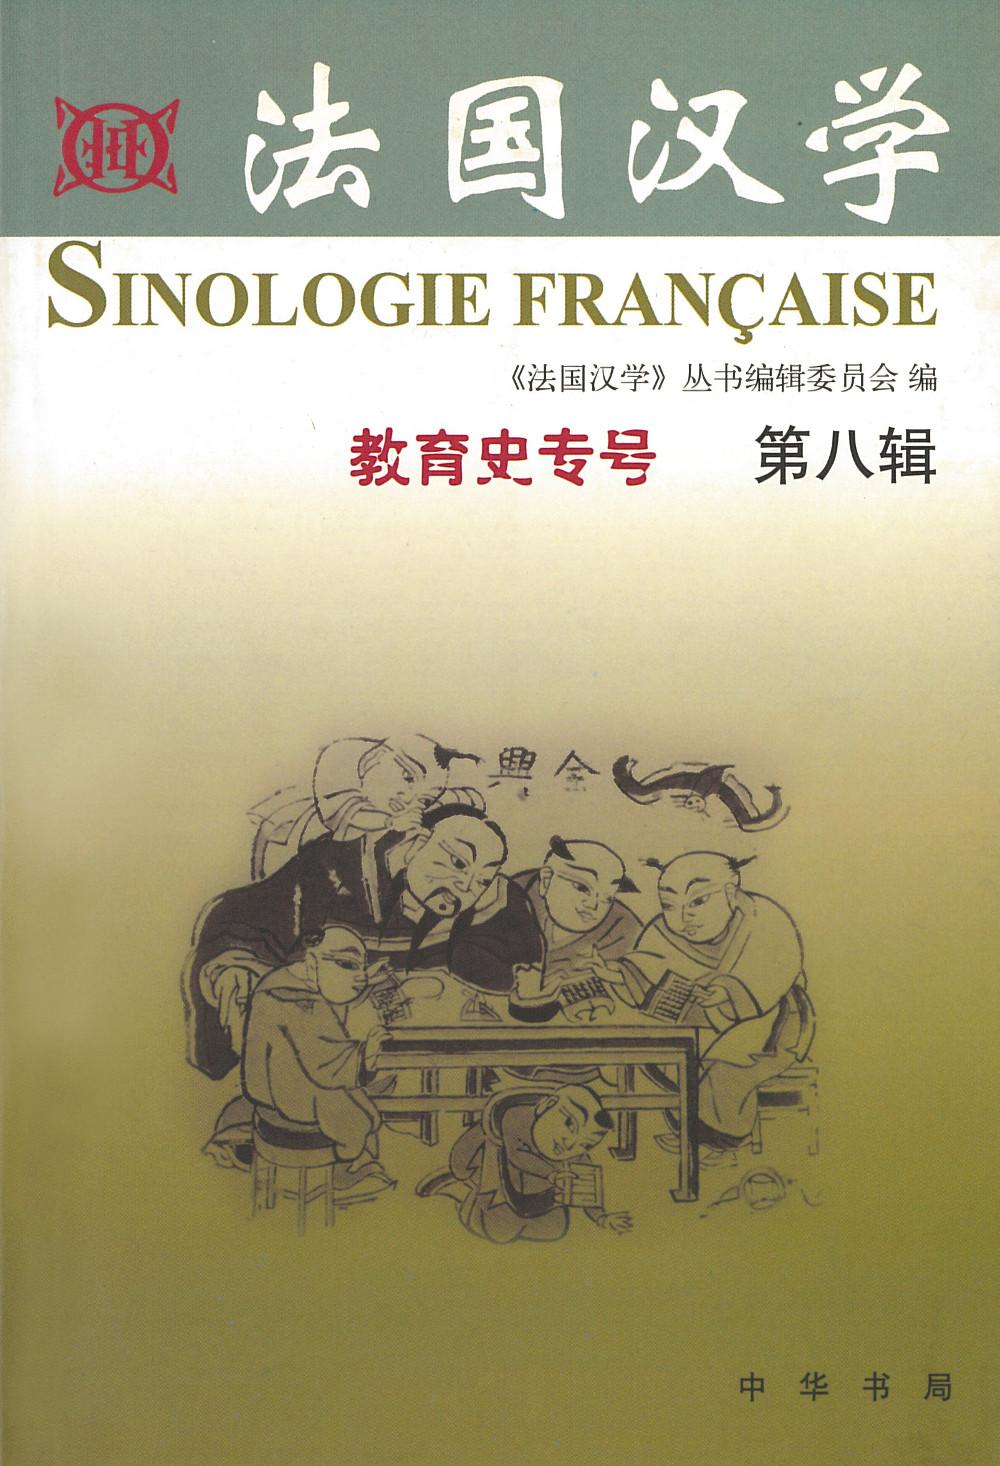 Faguo Hanxue [Sinologie française] 8